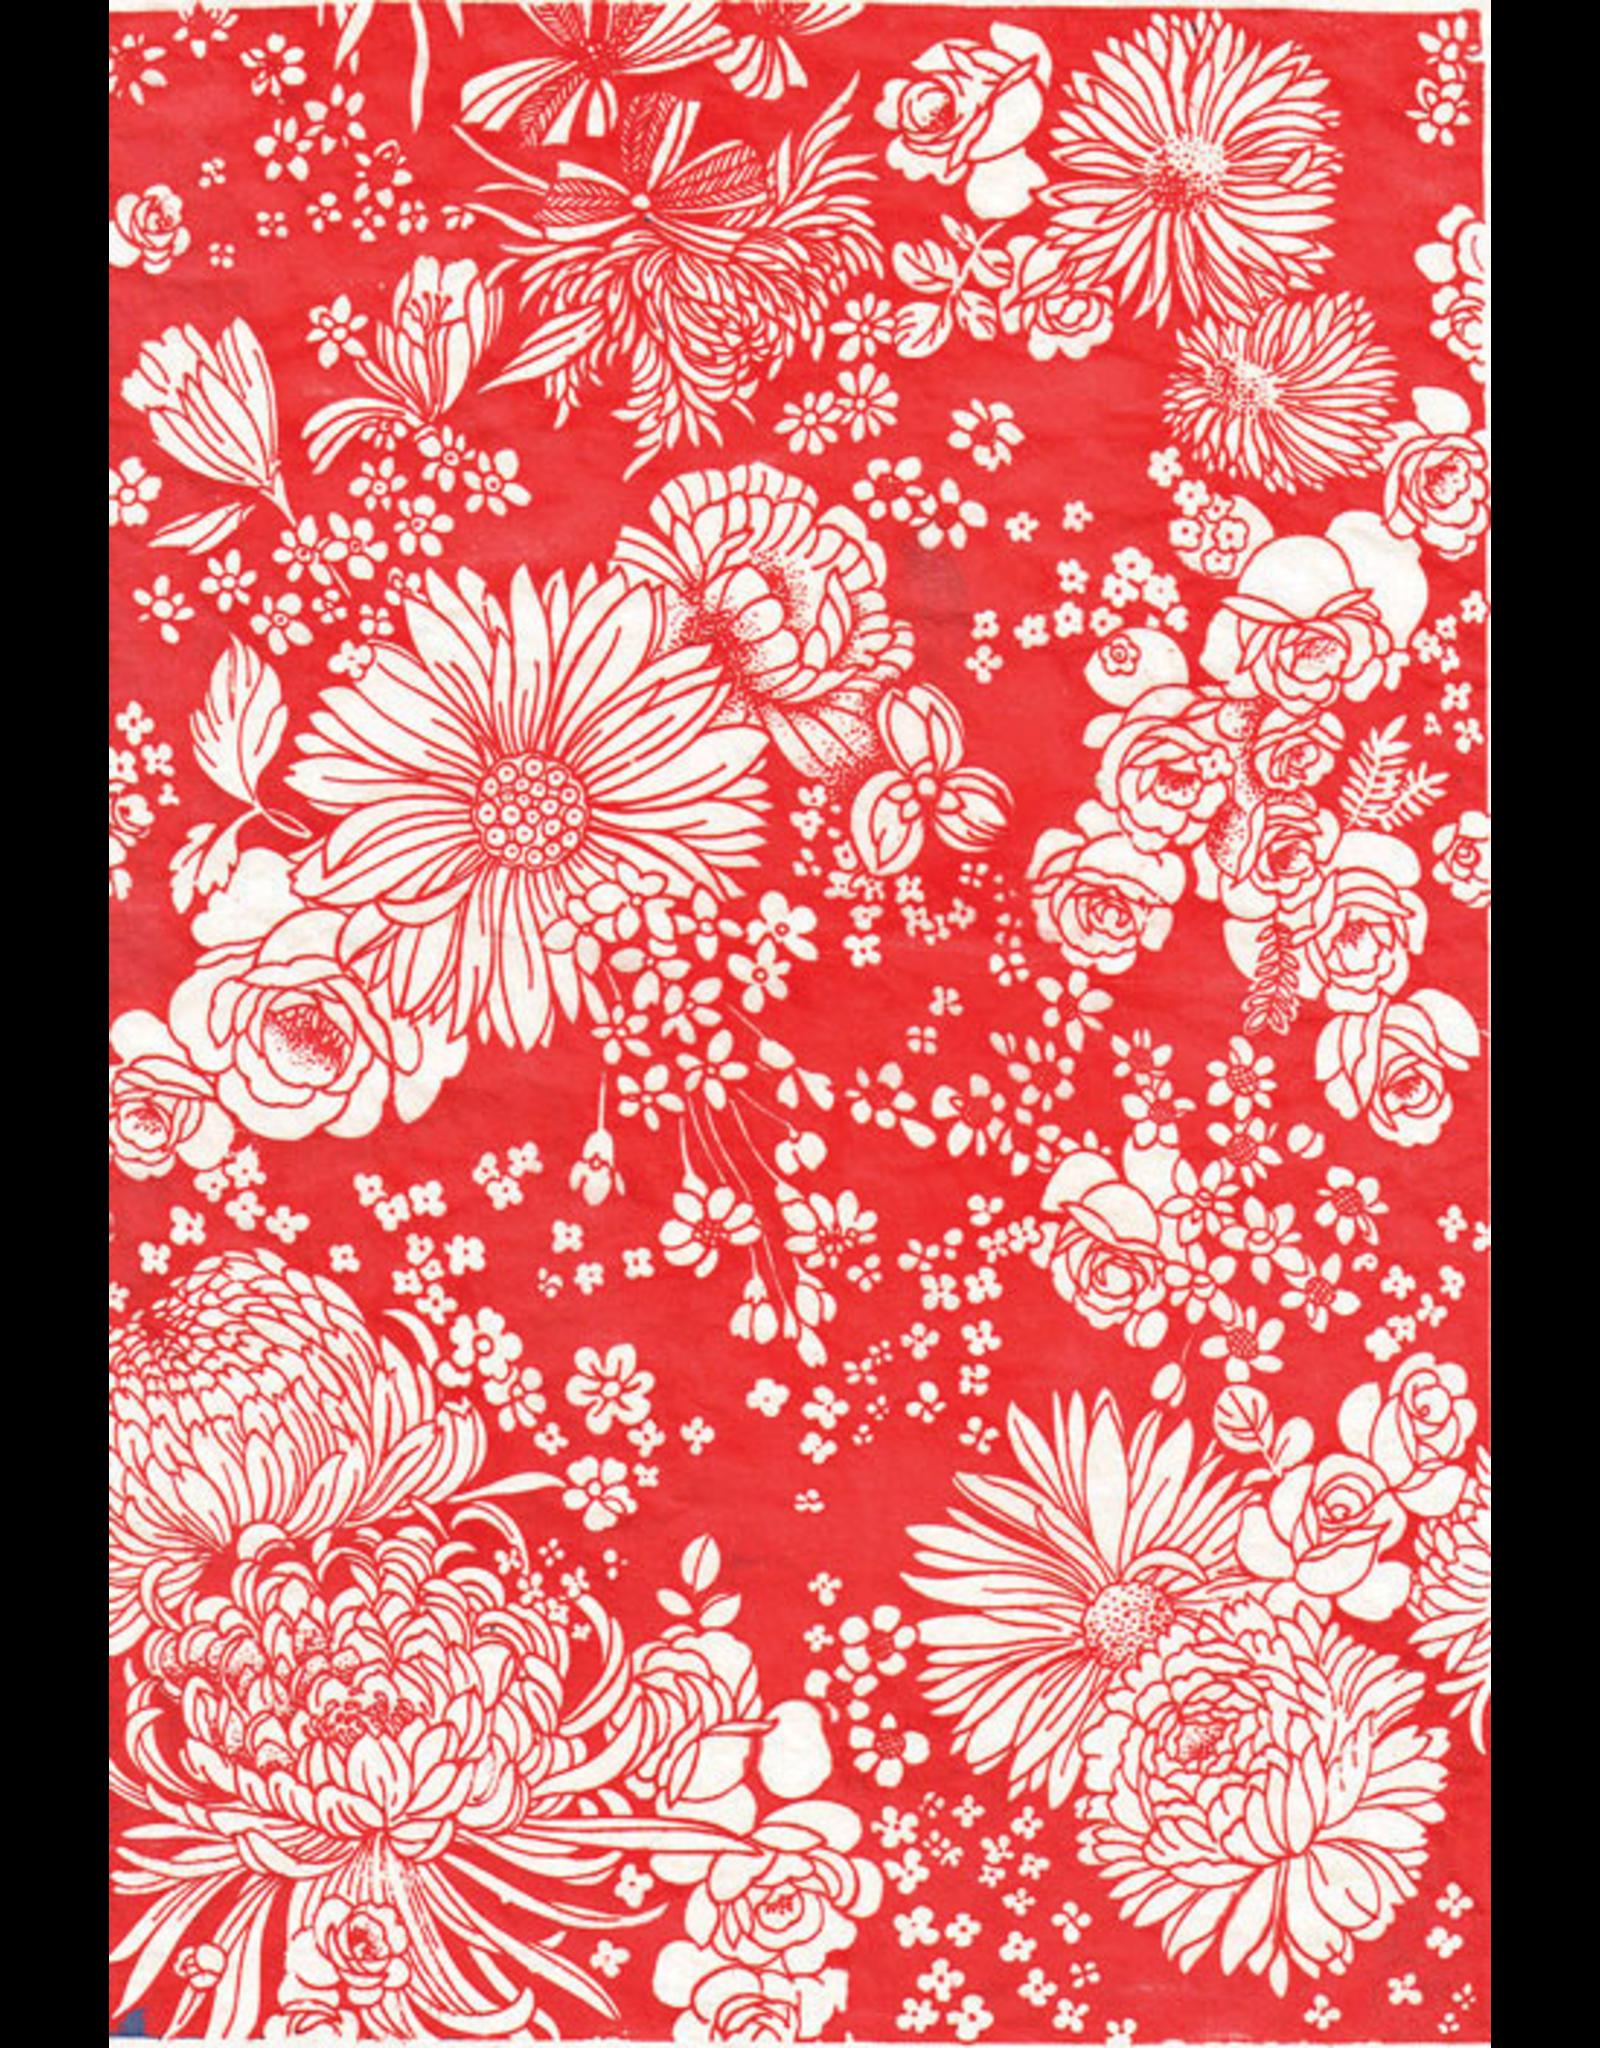 Sanbao Flower decal 01 (underglaze decal - 16cm x 22cm)